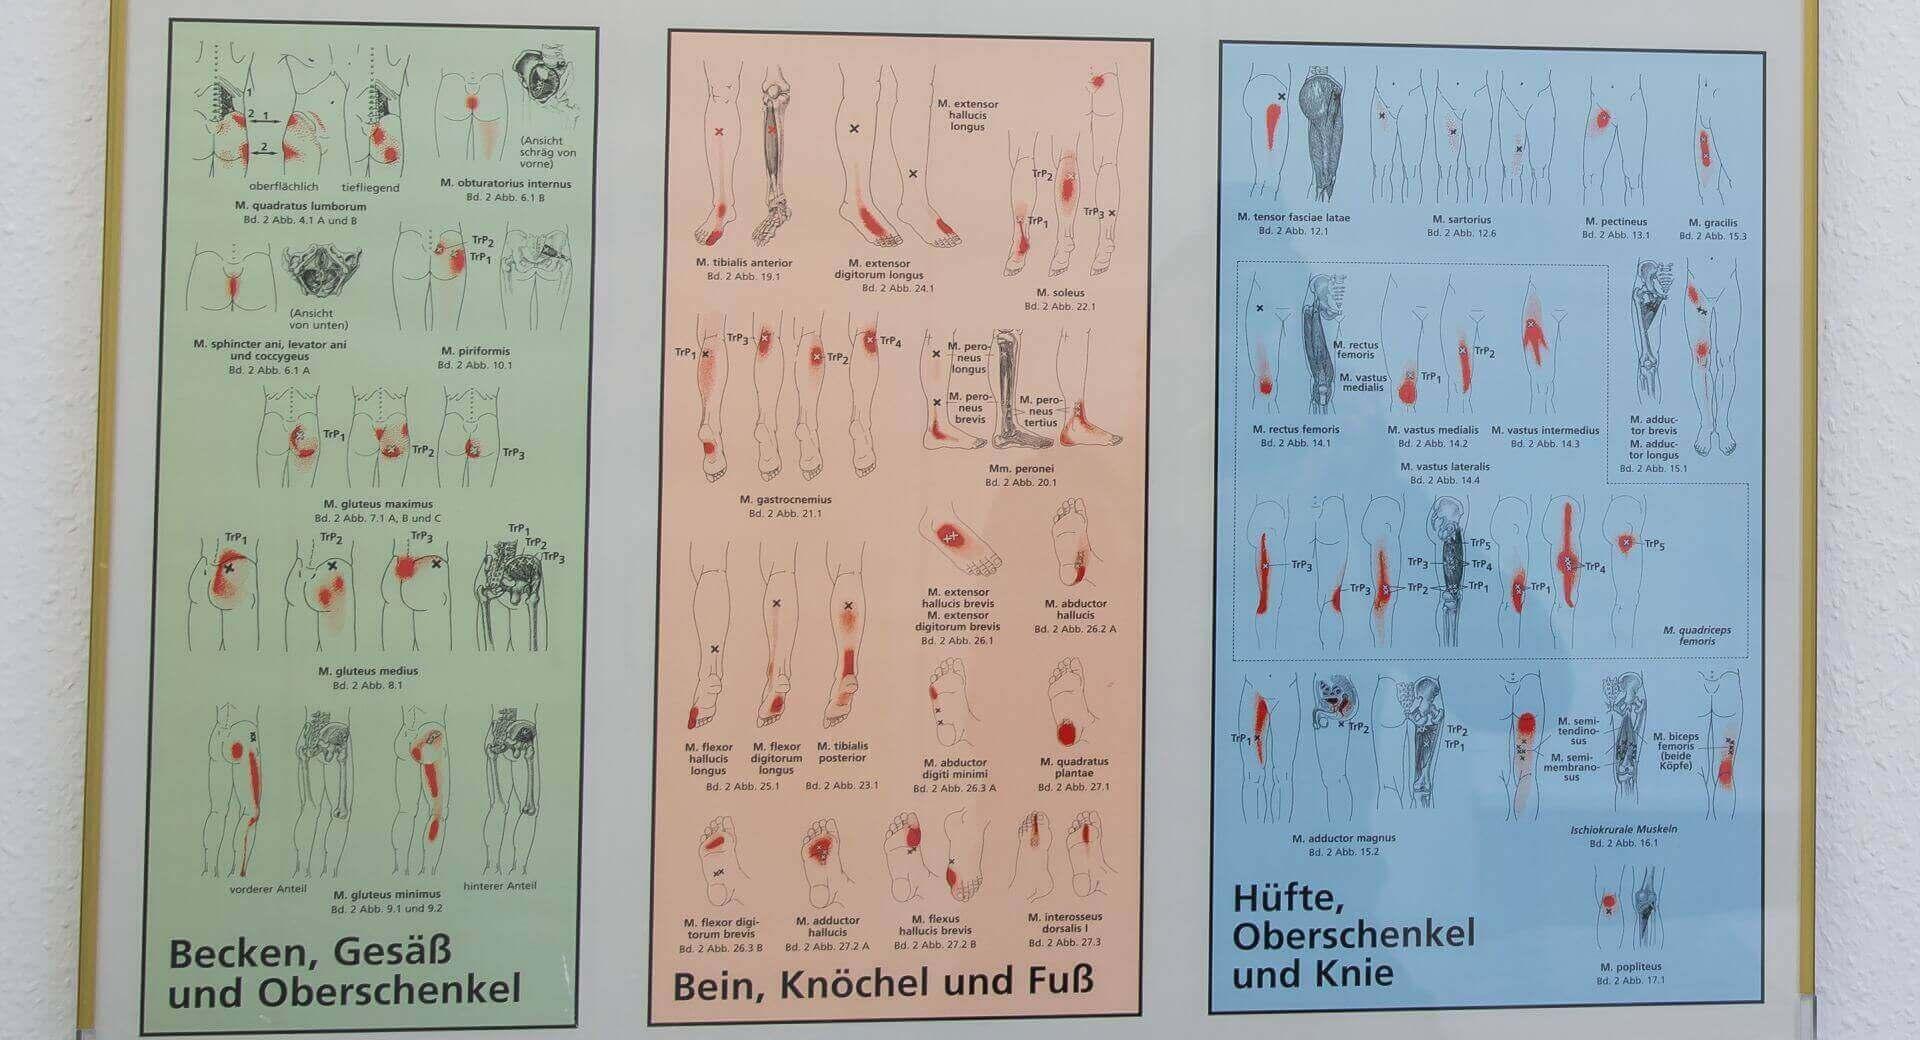 Großzügig Kirschner Draht Knöchel Galerie - Schaltplan Serie Circuit ...